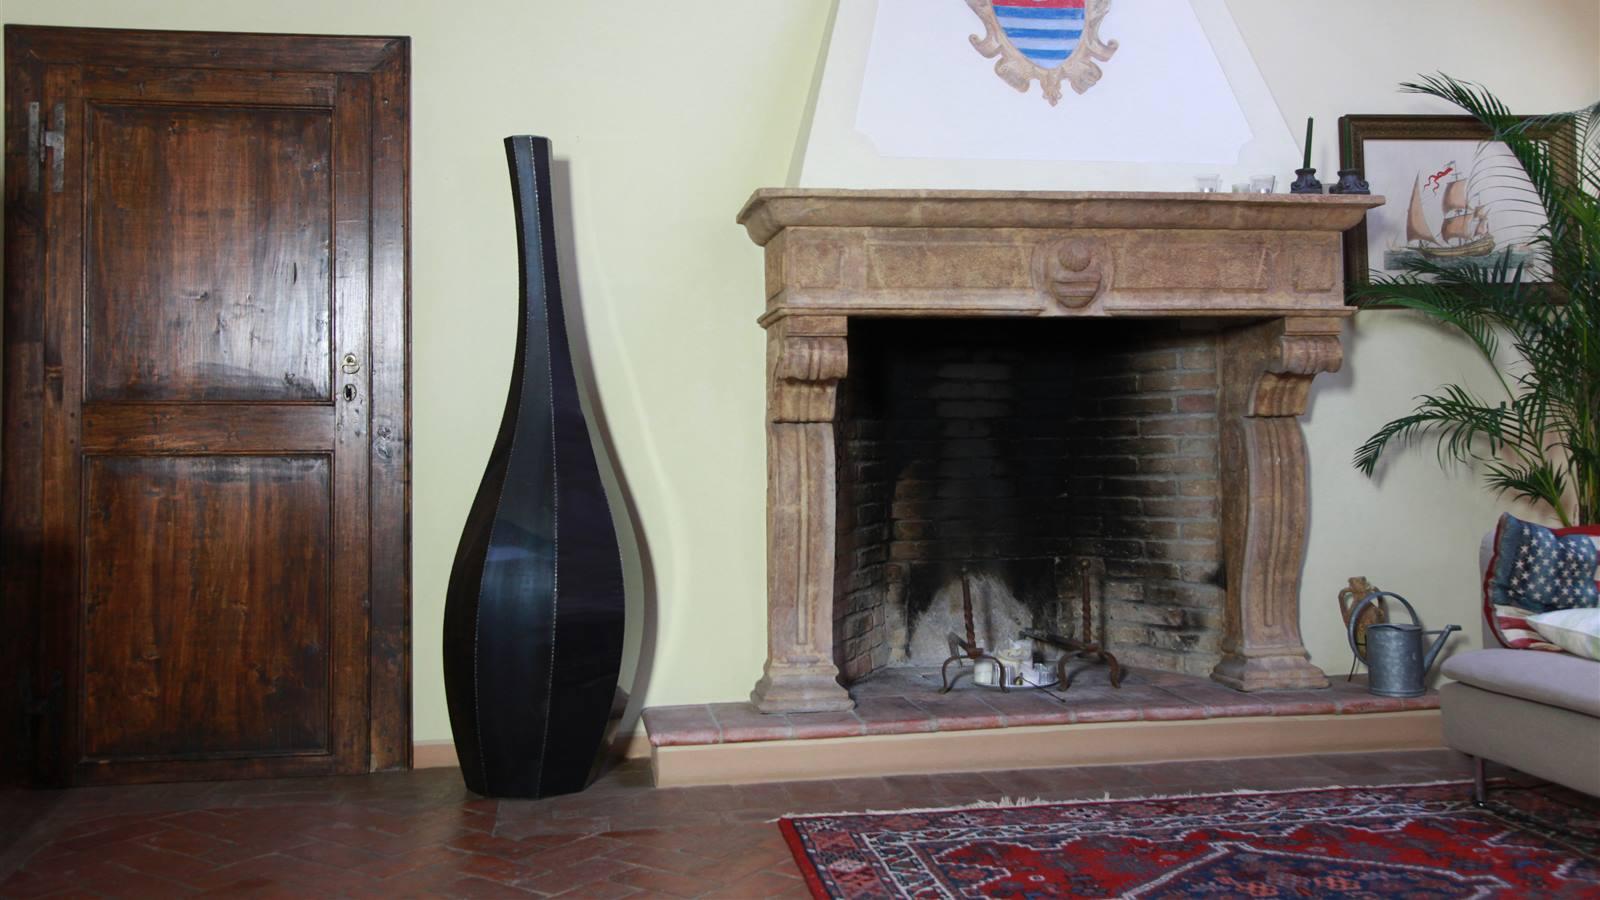 Petali G3P - Poligoni - Interior design made in Italy